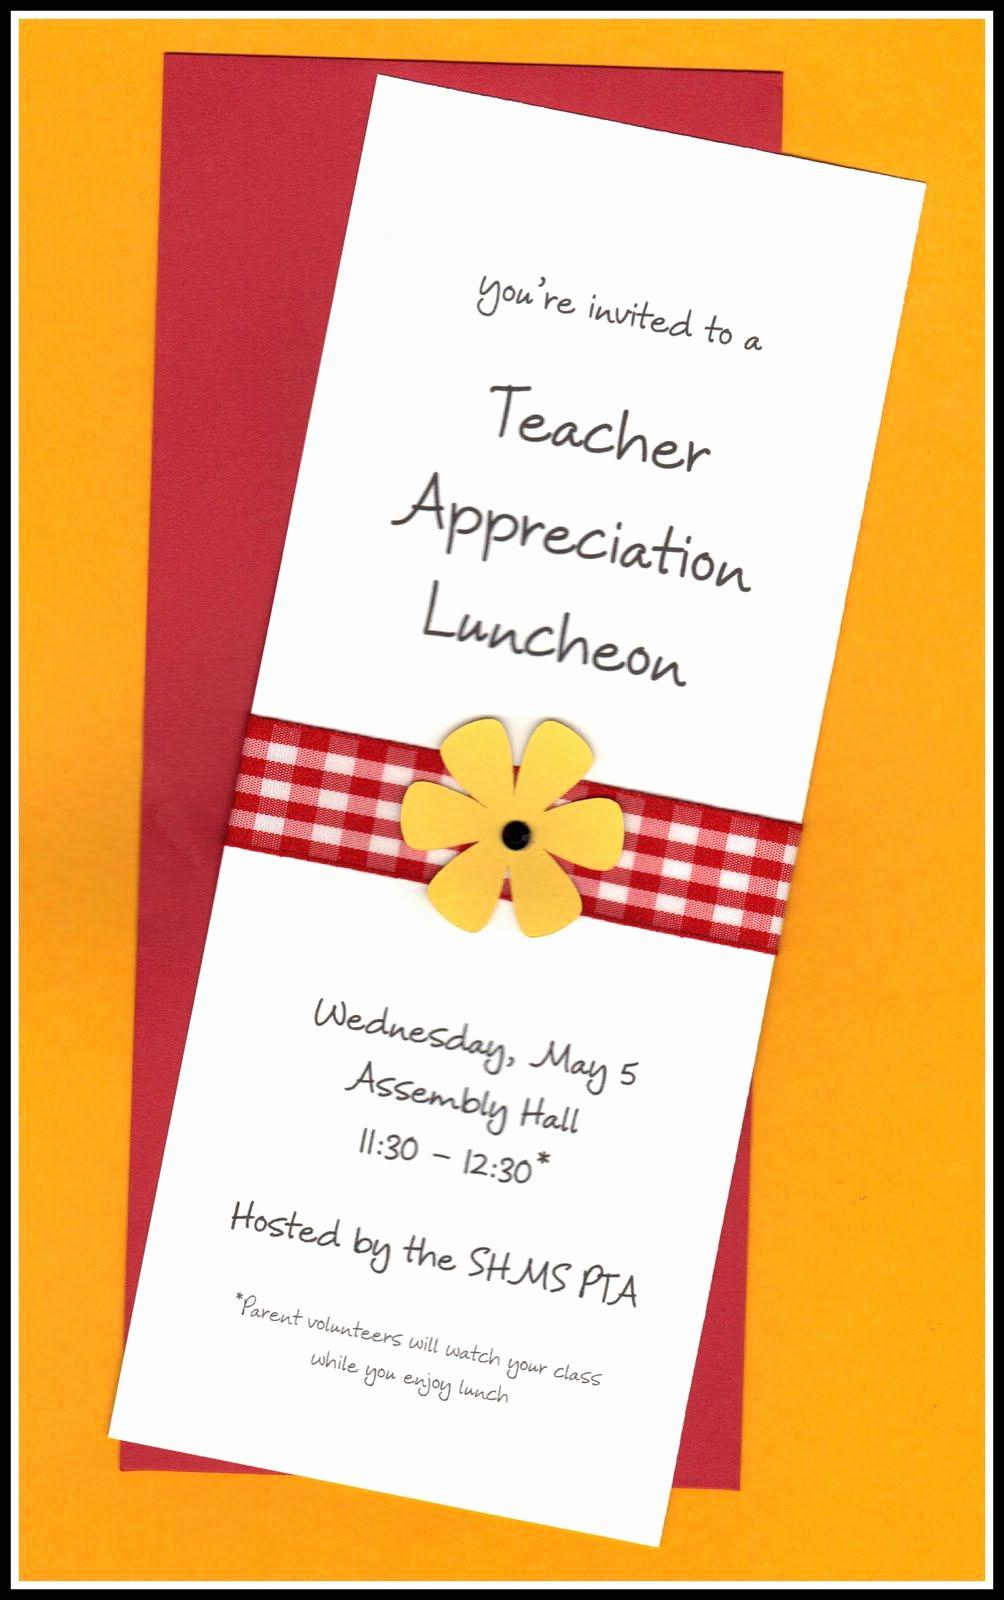 Sunday School Invitation Ideas Elegant Teacher Appreciation Invitation Wording Teacher